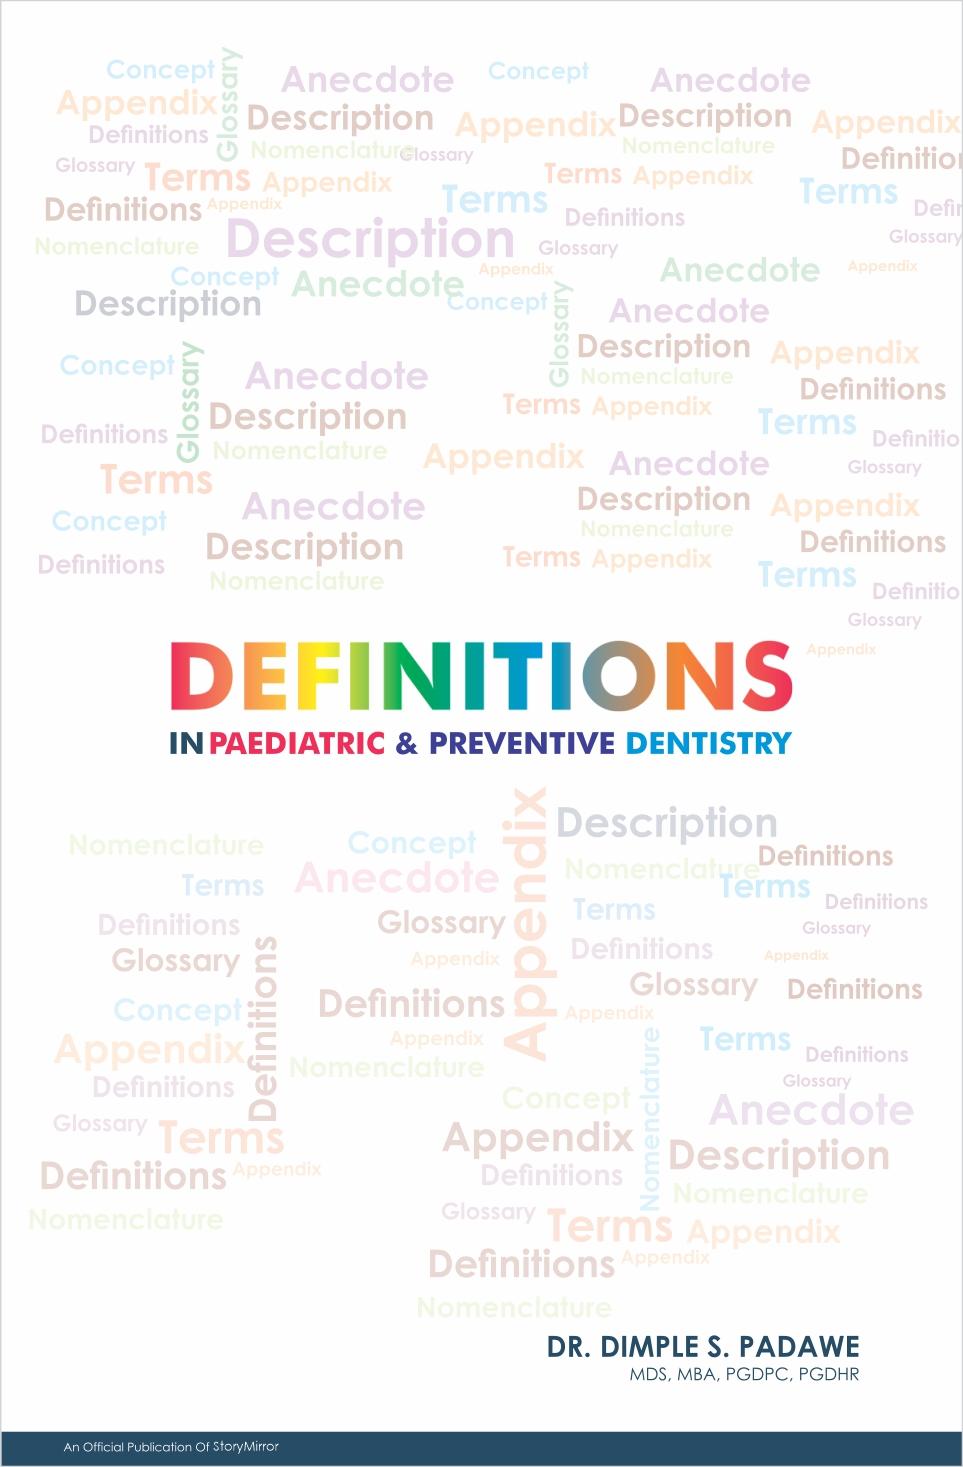 Definitions in Paediatric & Preventive Dentistry